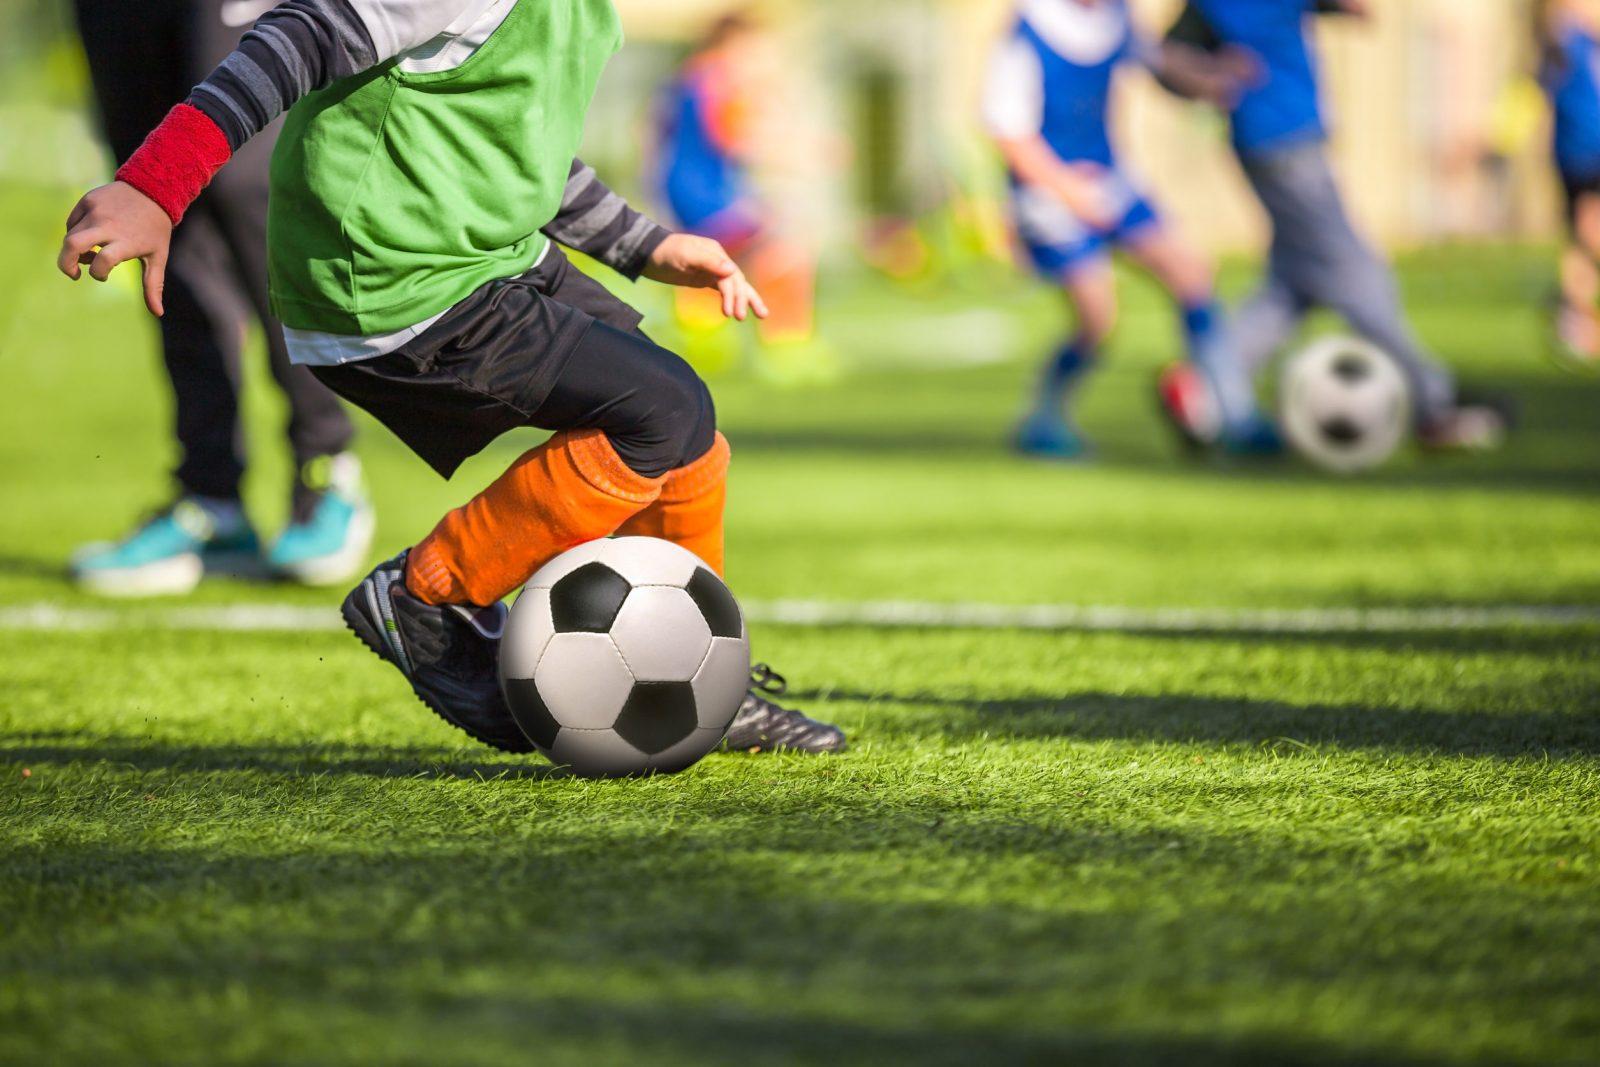 Soccer et débutant